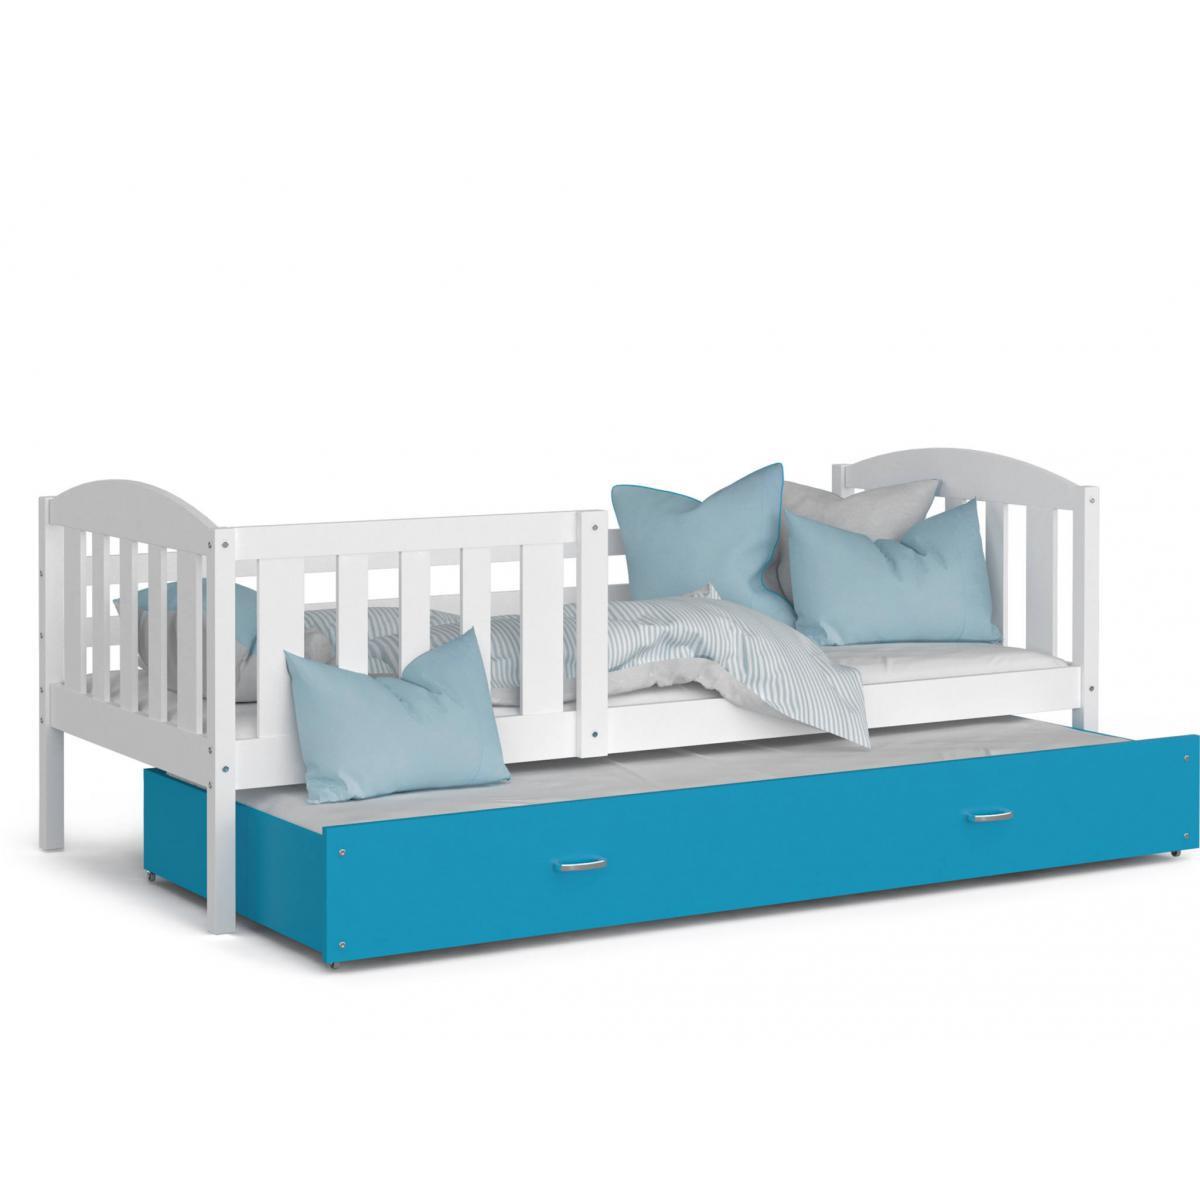 Kids Literie LIT Gigogne Teo 90x190 Blanc - Bleu livré avec sommier, tiroir et matelas de 7cm OFFERT.